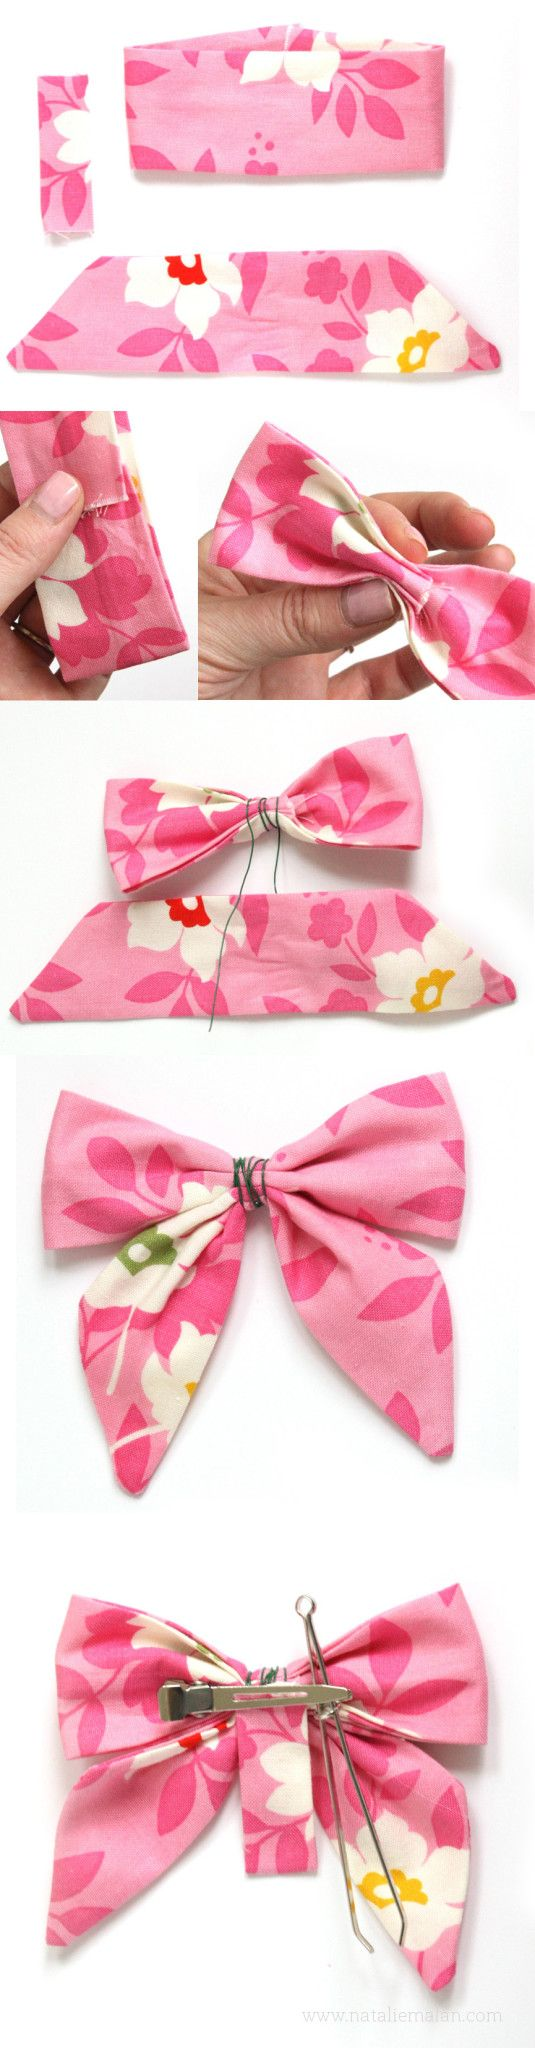 DIY Sailor Bow tutorial and free pattern girls hair bow Dalmatian bow hair bow tutorial template free download |NatalieMalan.com